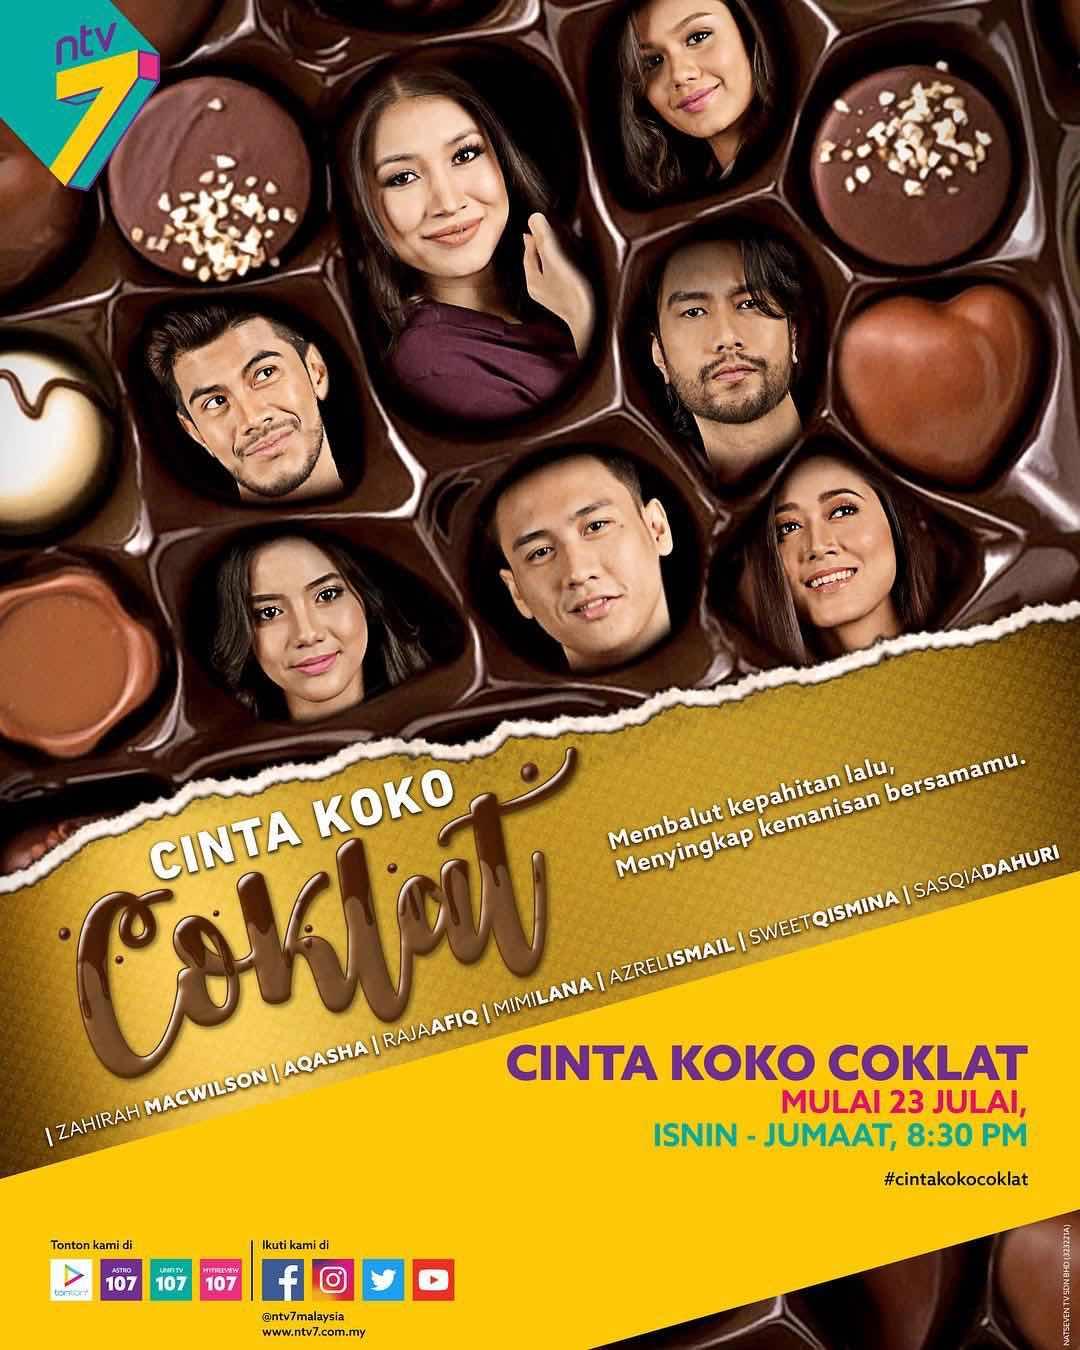 %255BUNSET%255D - Sinopsis Drama Cinta Koko Coklat (slot Glamadrama NTV7)